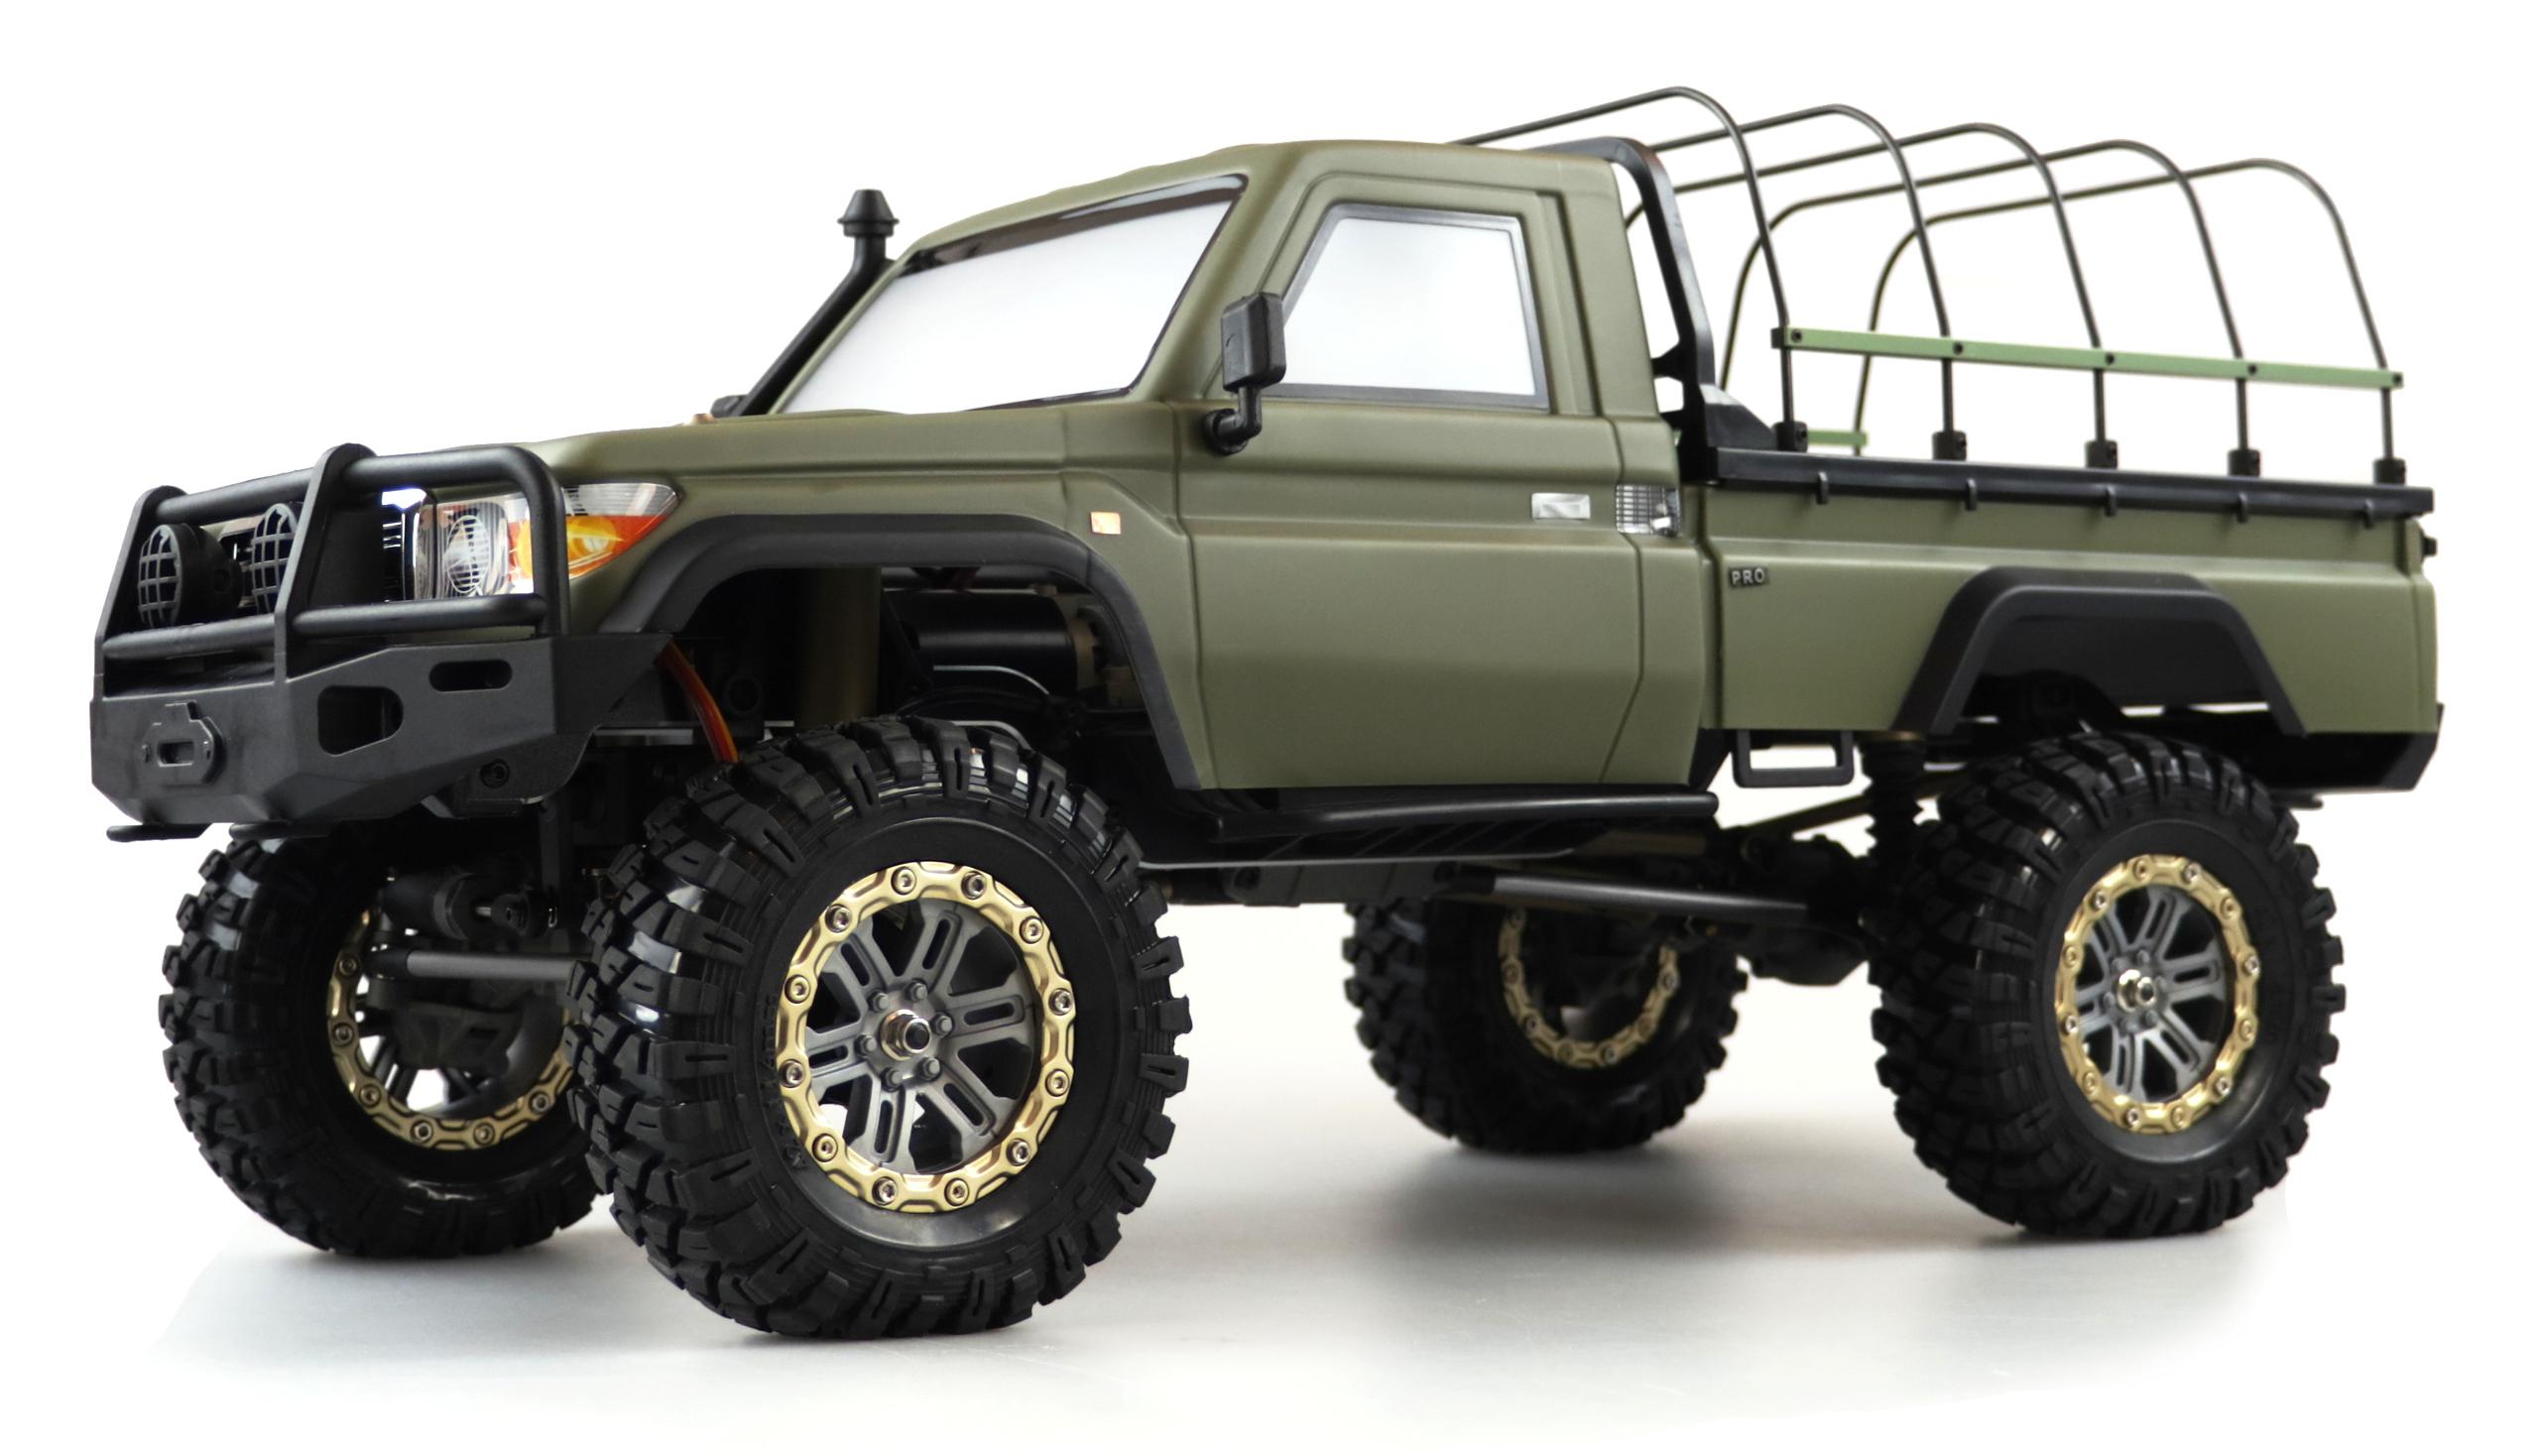 Amewi AMXROCK RCX10BS - Off-Road-Wagen - Elektromotor - 1:10 - Betriebsbereit (RTR) - Grün - Metall